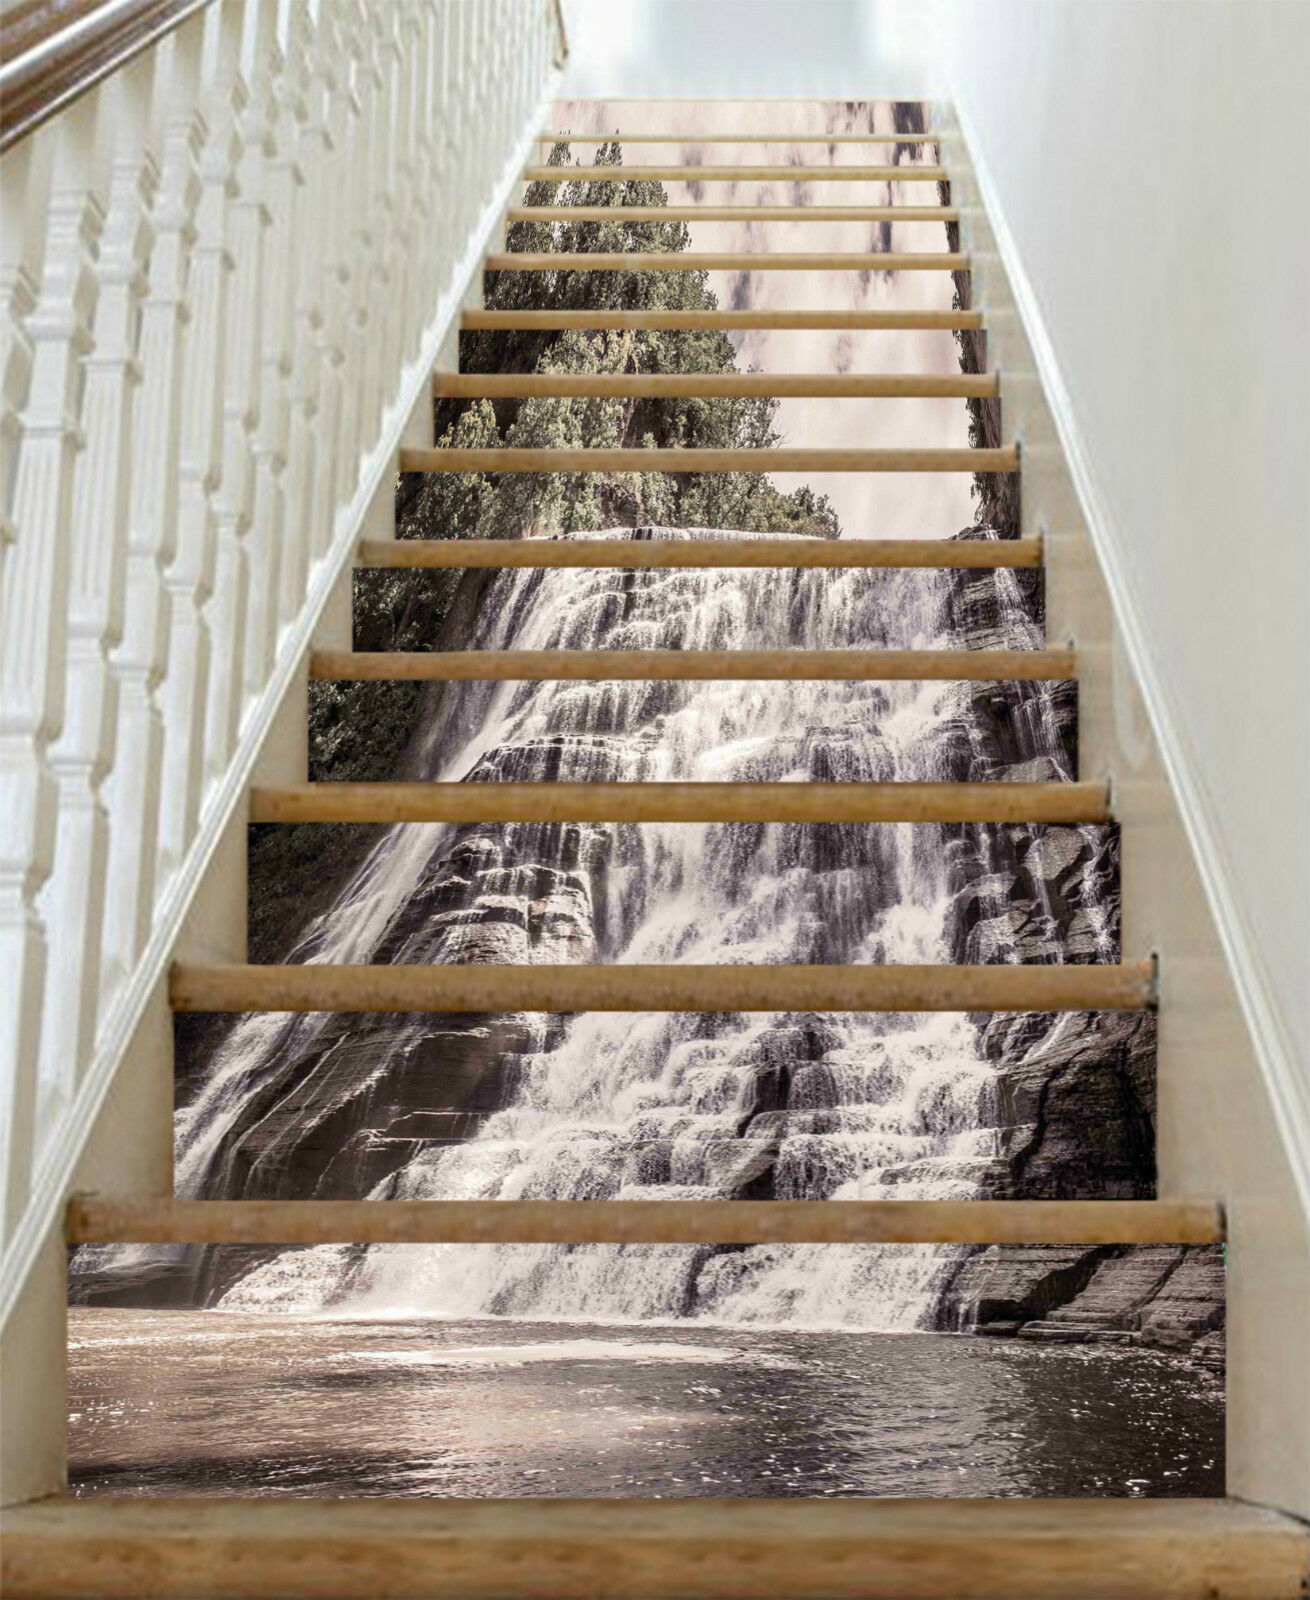 3D Strom Wald 1143 Stair Risers Dekoration Fototapete Vinyl Aufkleber Tapete DE